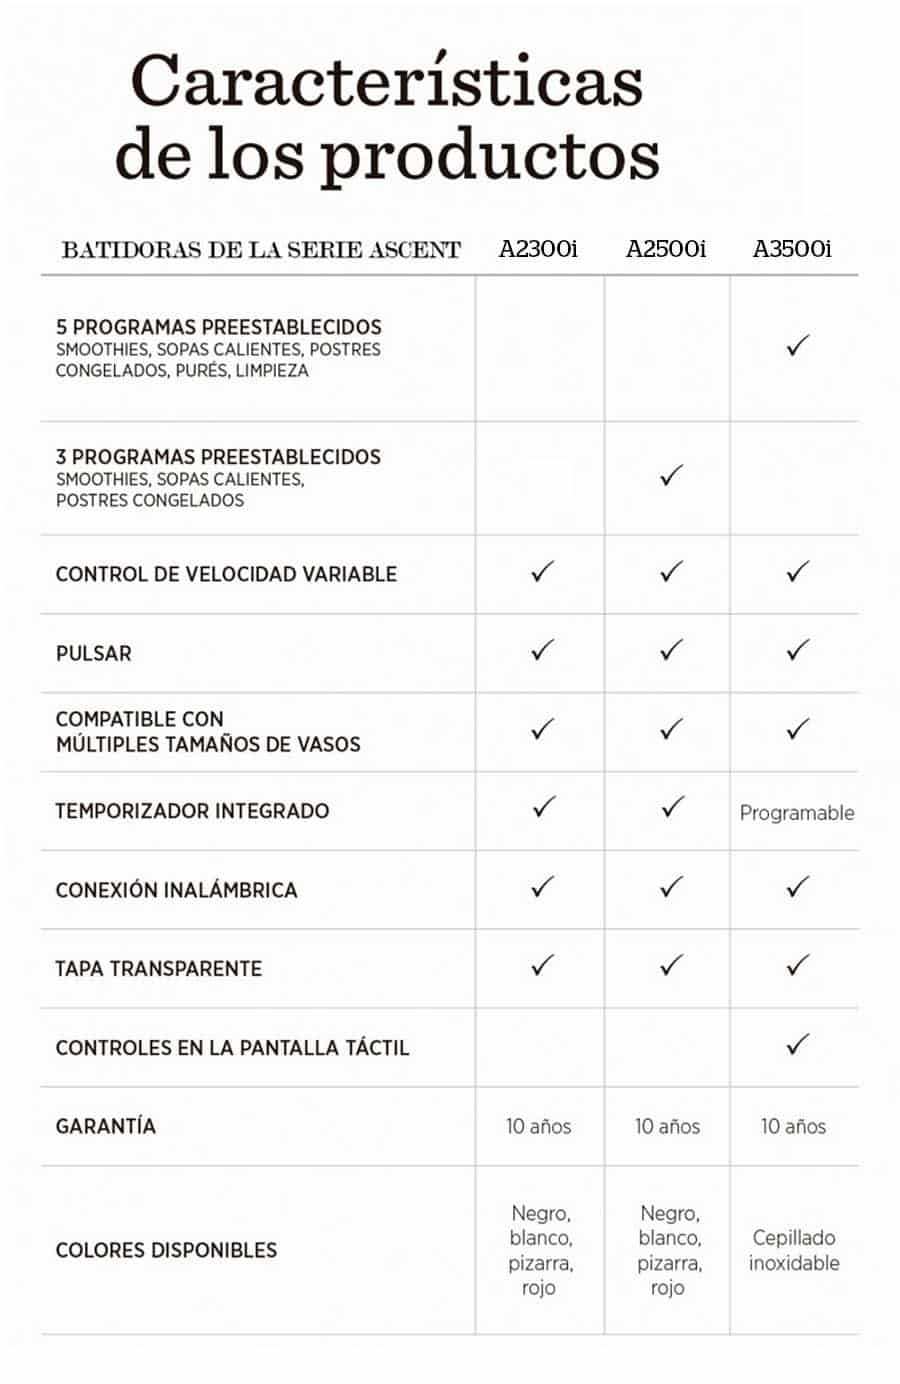 Diferencias entre los modelos Ascent de Vitamix